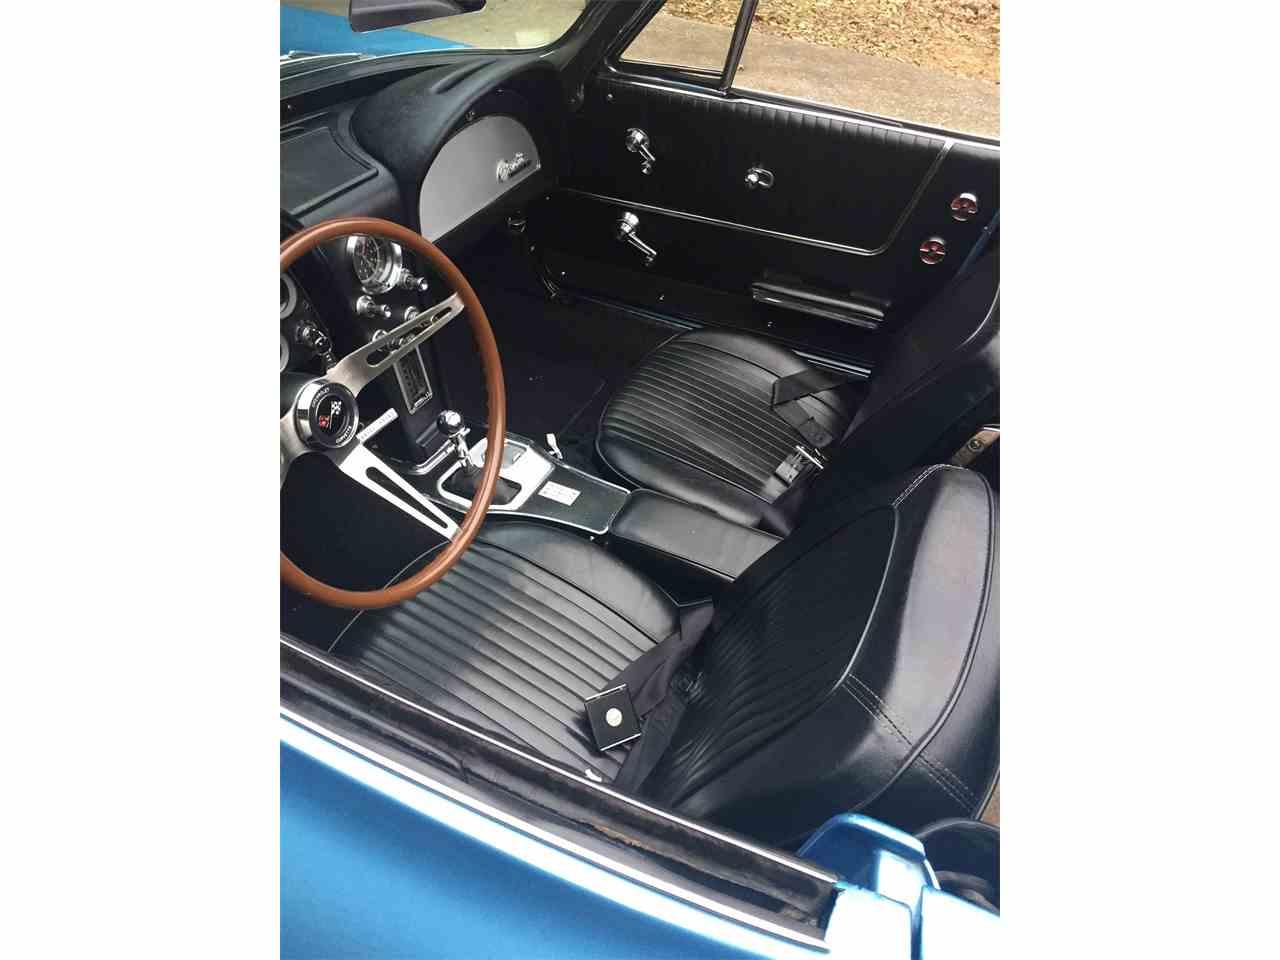 Large Picture of Classic '64 Corvette - $49,000.00 - MC5G